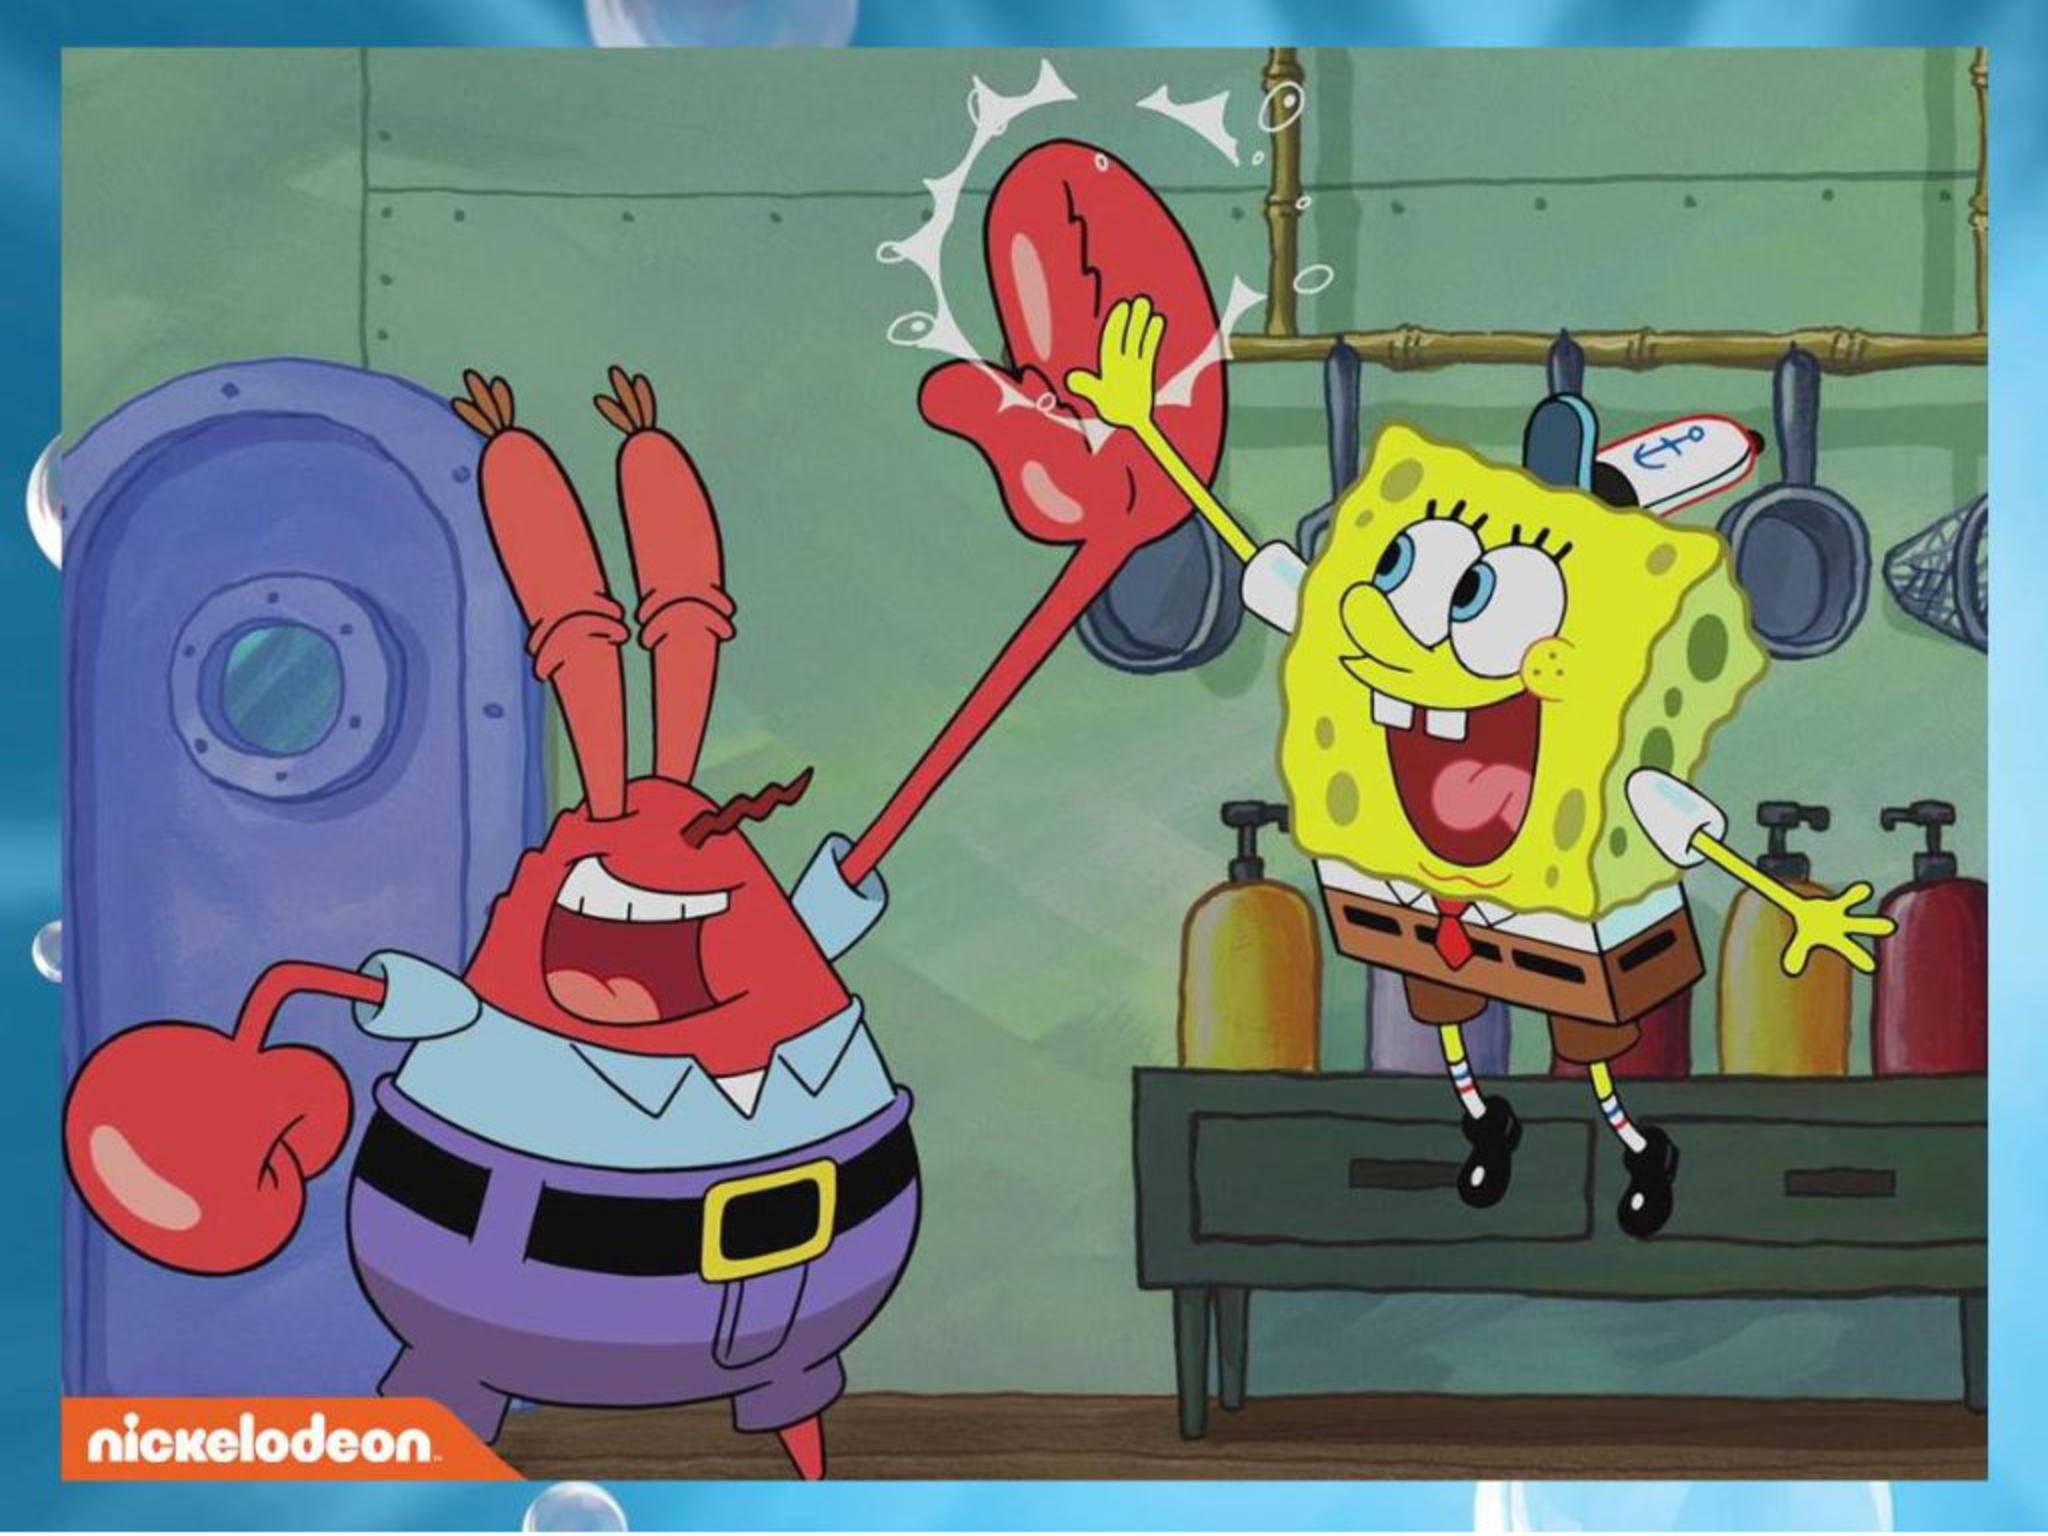 WhatsApp Bilder Facebook_SpongeBob Schwammkopf 1